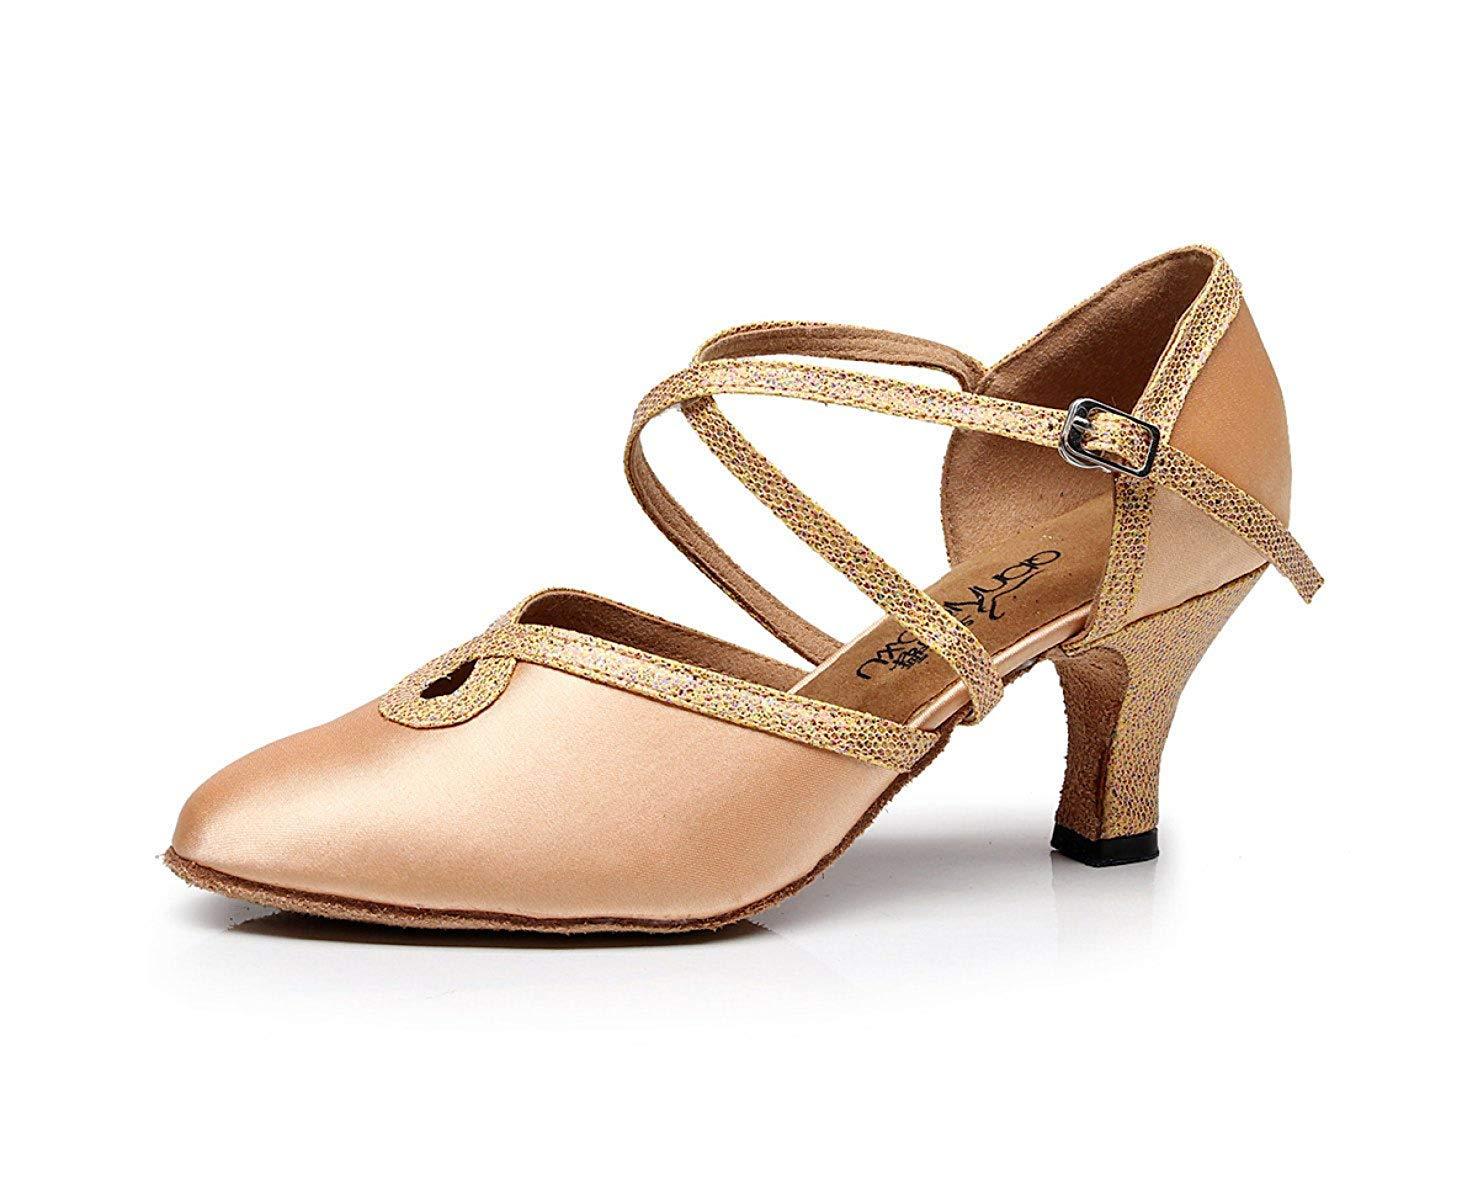 Yingsssq damen Latin Dance Closed Toe Hohe Ferse Tango Chacha Samba Modern Jazz Schuhe Sandalen Braun-Absatz 6cm-UK4   EU35   Our36